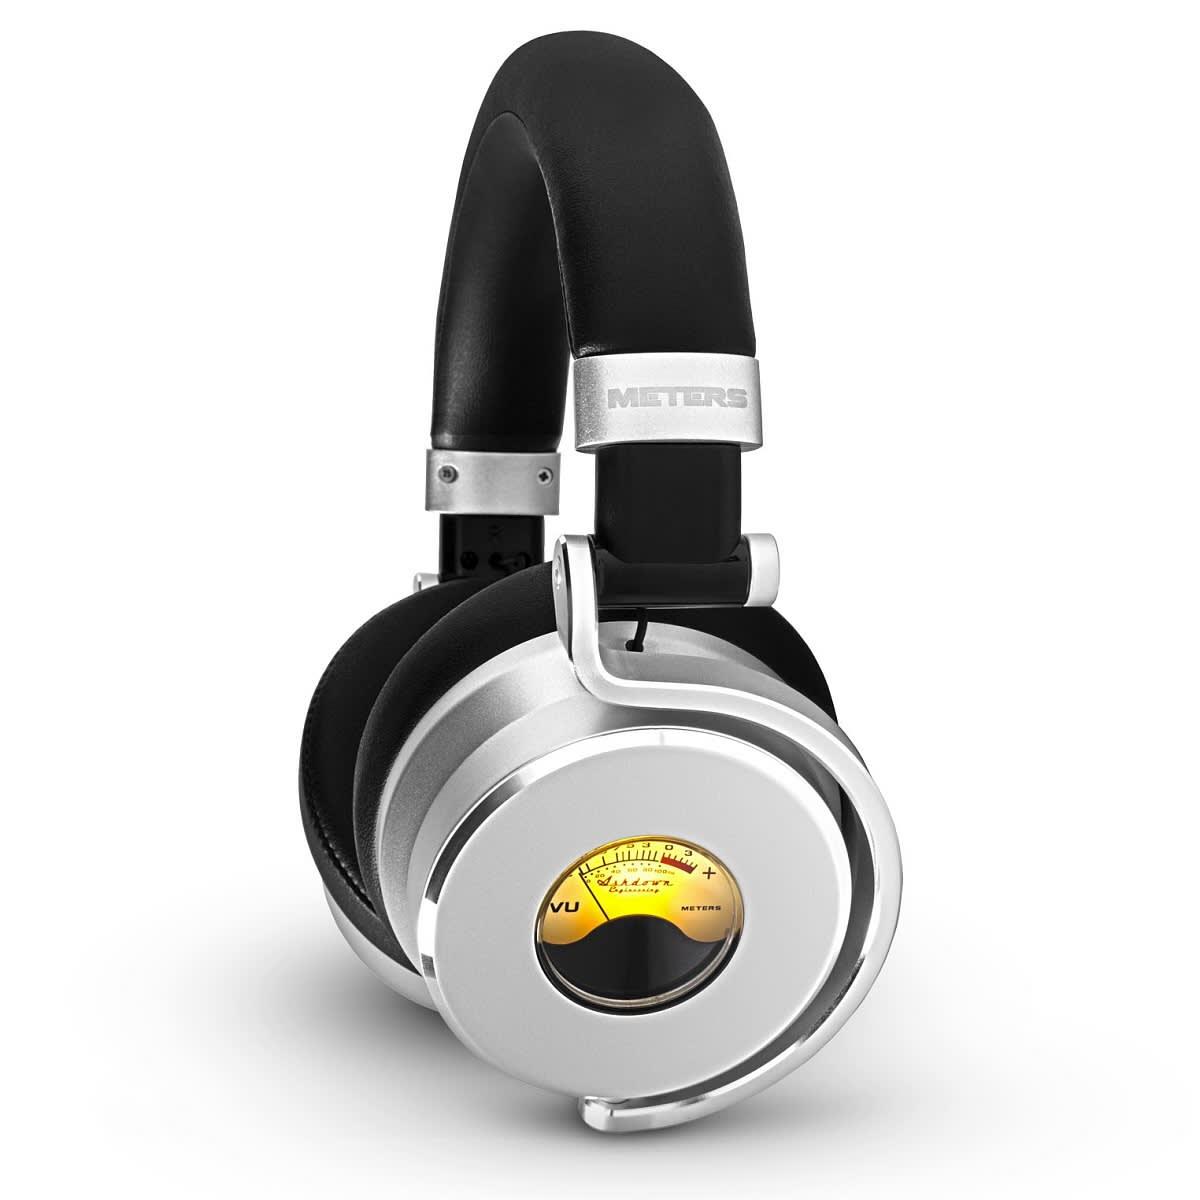 689928cc7cc ✅ Meters Music OV-1 Bluetooth Headphone (Meters Music)